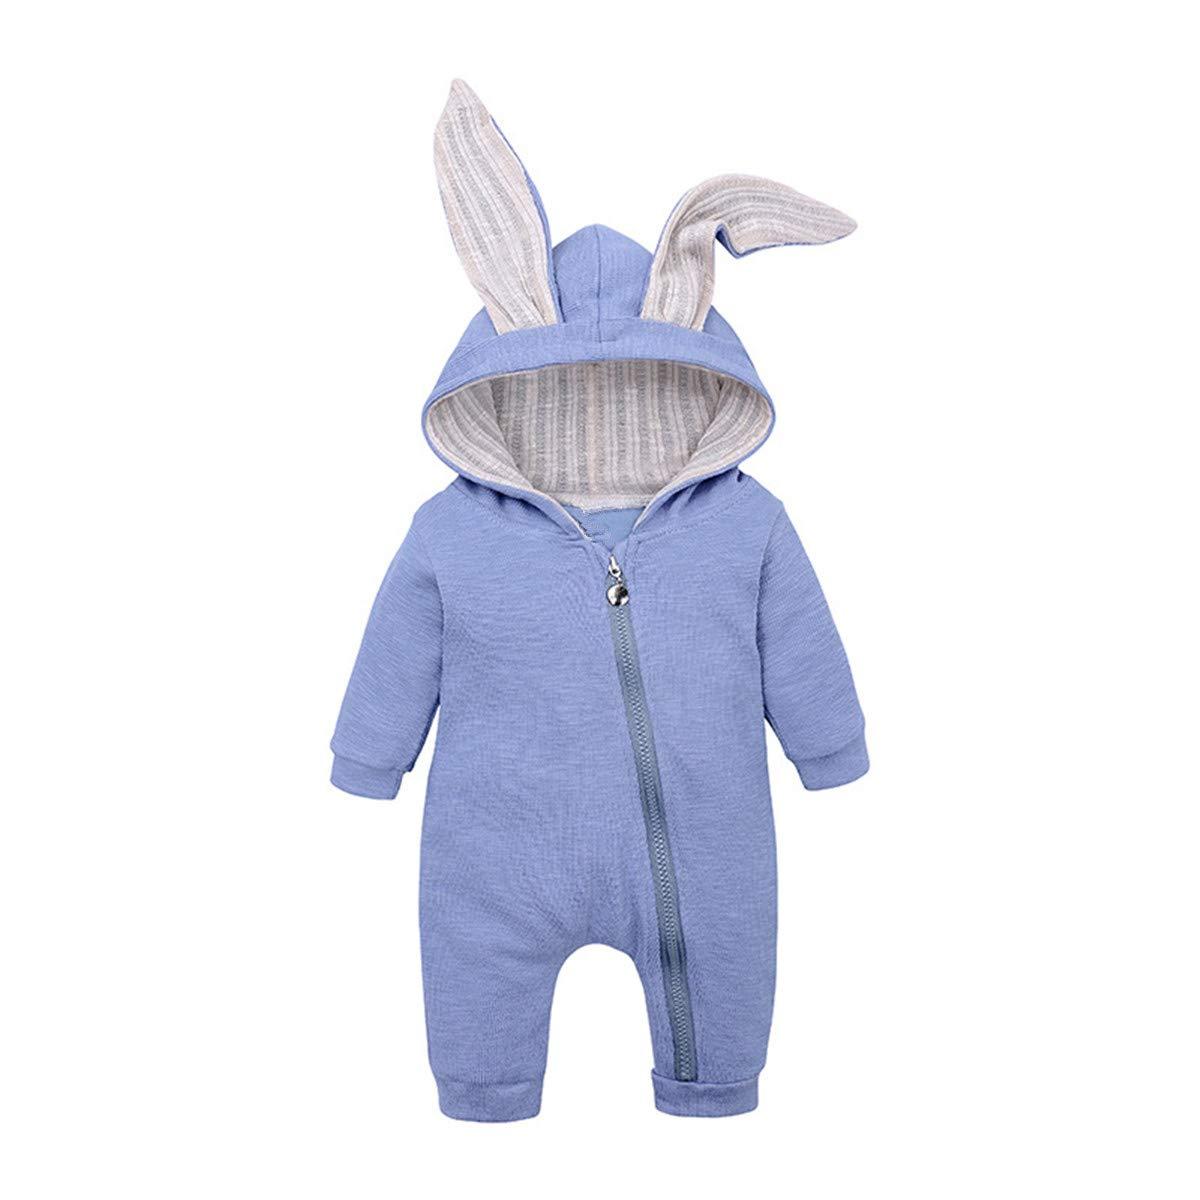 ZIYOYOR Baby Boys Girls Rabbit Ear Zipper Hooded Romper Newborn Baby Bunny Long Sleeve Jumpsuit Outfits